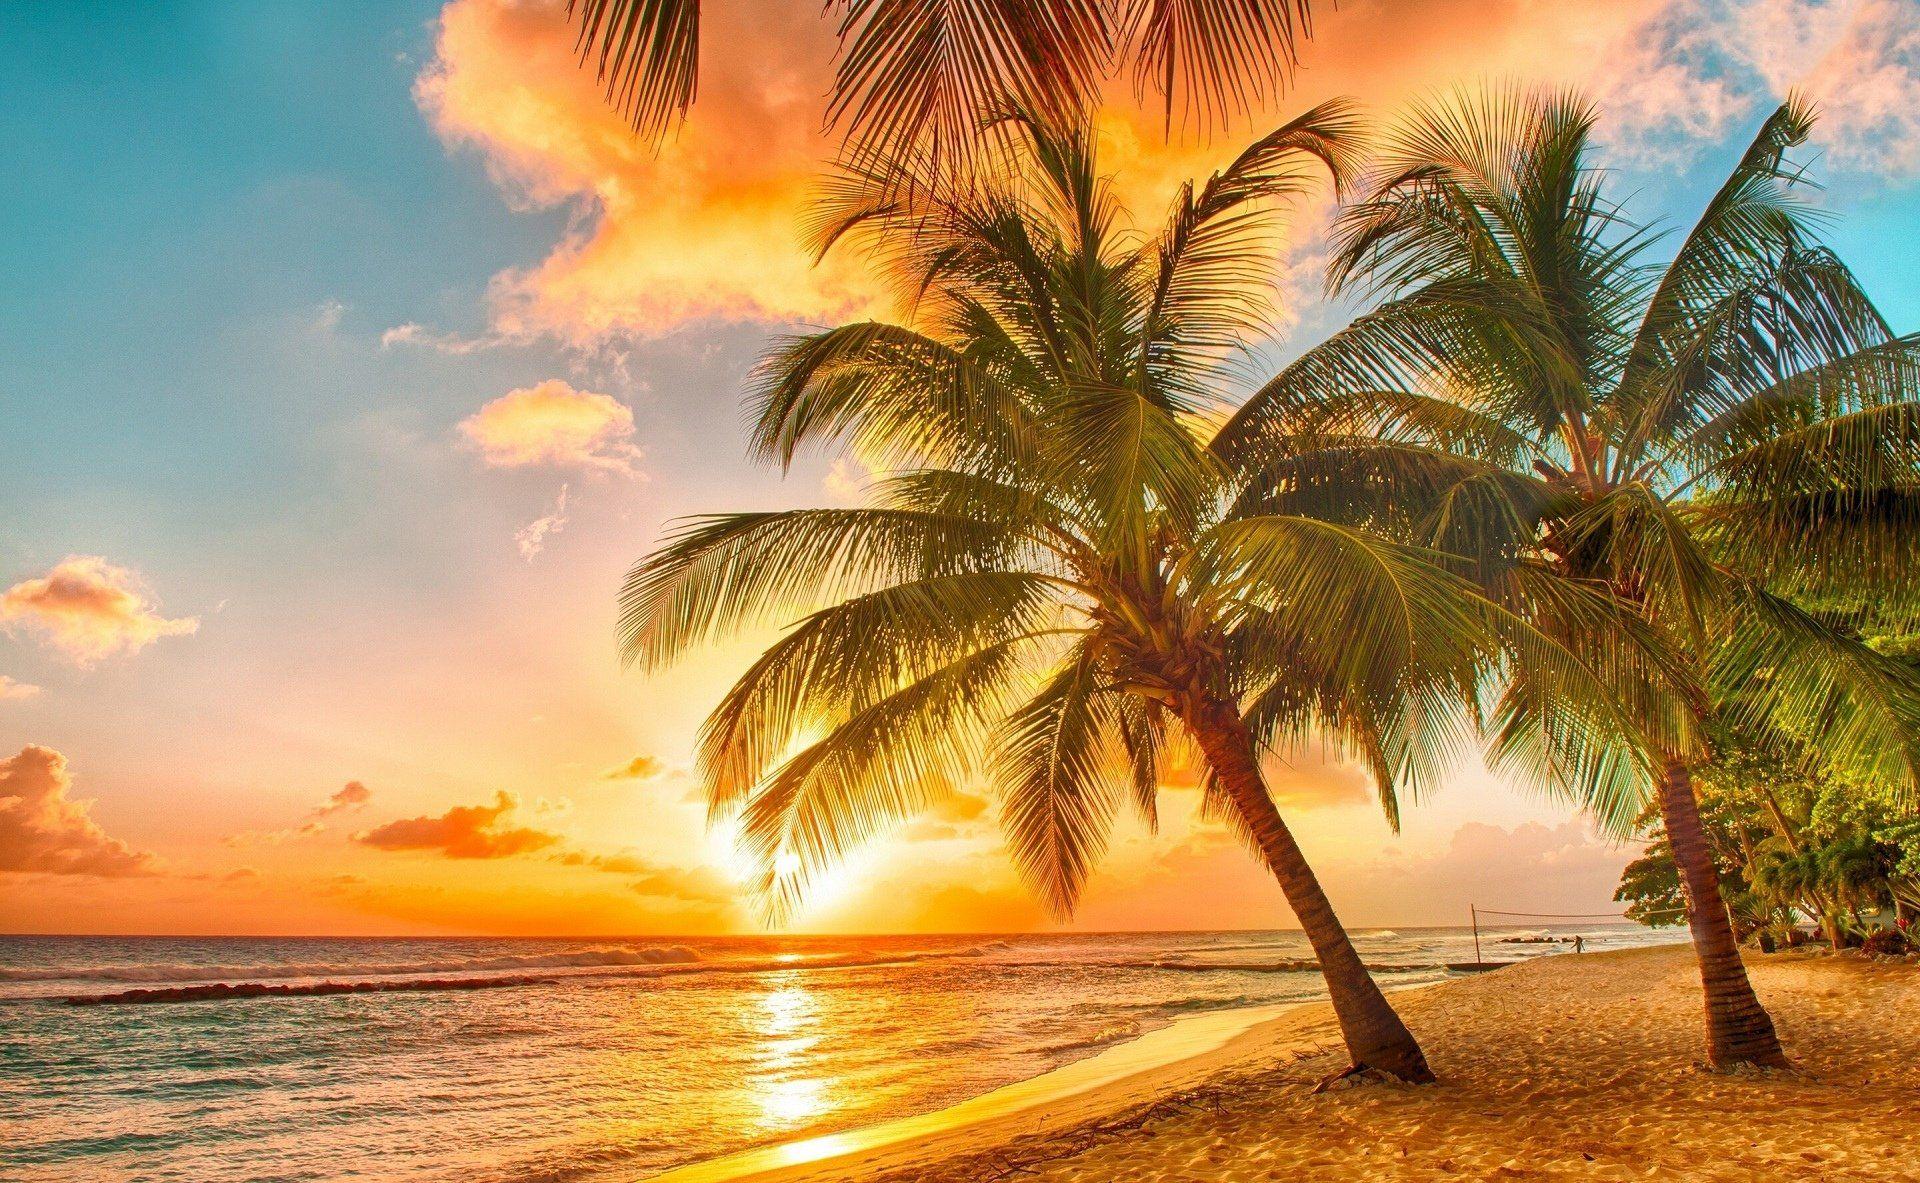 sunset hammock | The Heartbreak Hypnotist ? - Sean Wheeler | Pure ...